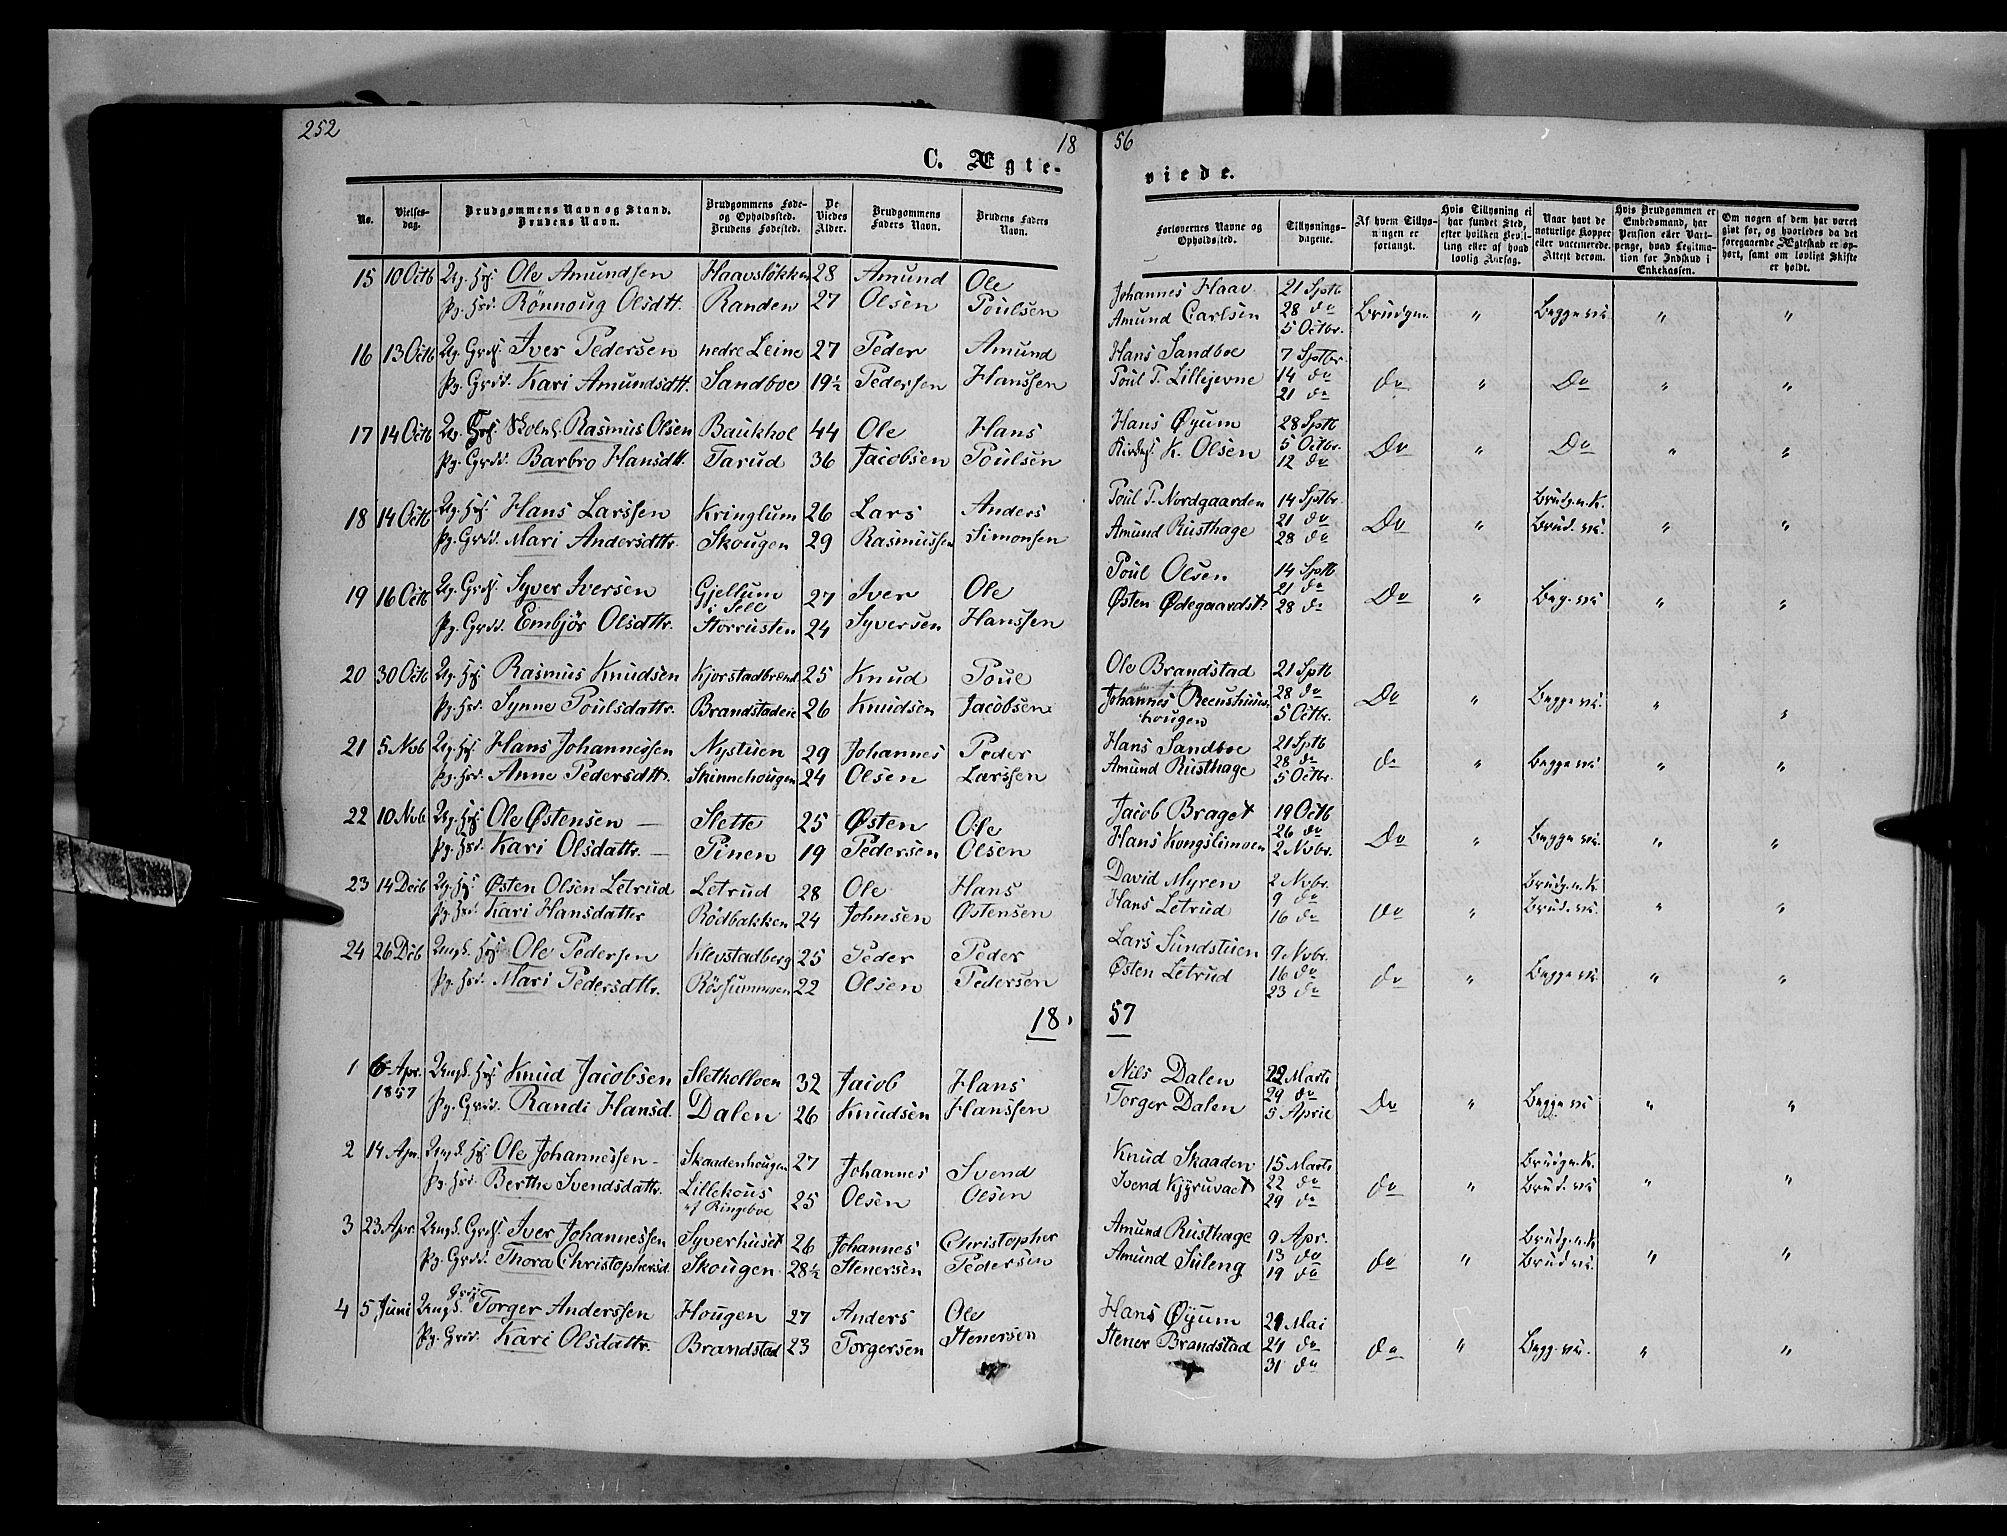 SAH, Nord-Fron prestekontor, Ministerialbok nr. 1, 1851-1864, s. 252